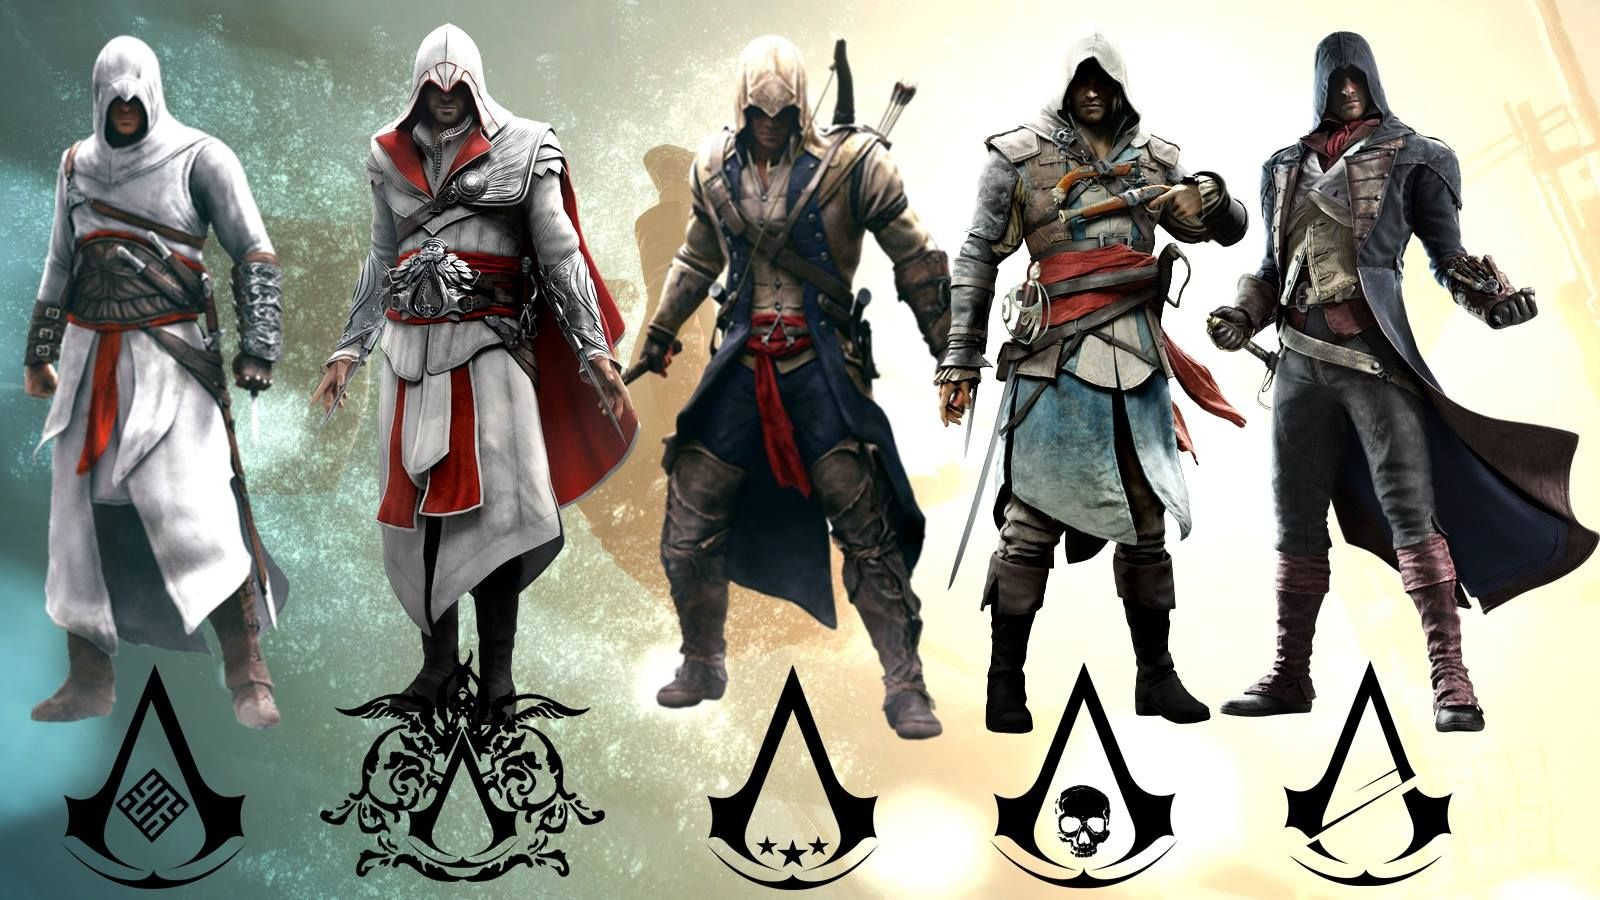 Assassins Altair Ezio Connor Edward Arno Assassins Creed Assasins Creed Assassin S Creed Wallpaper